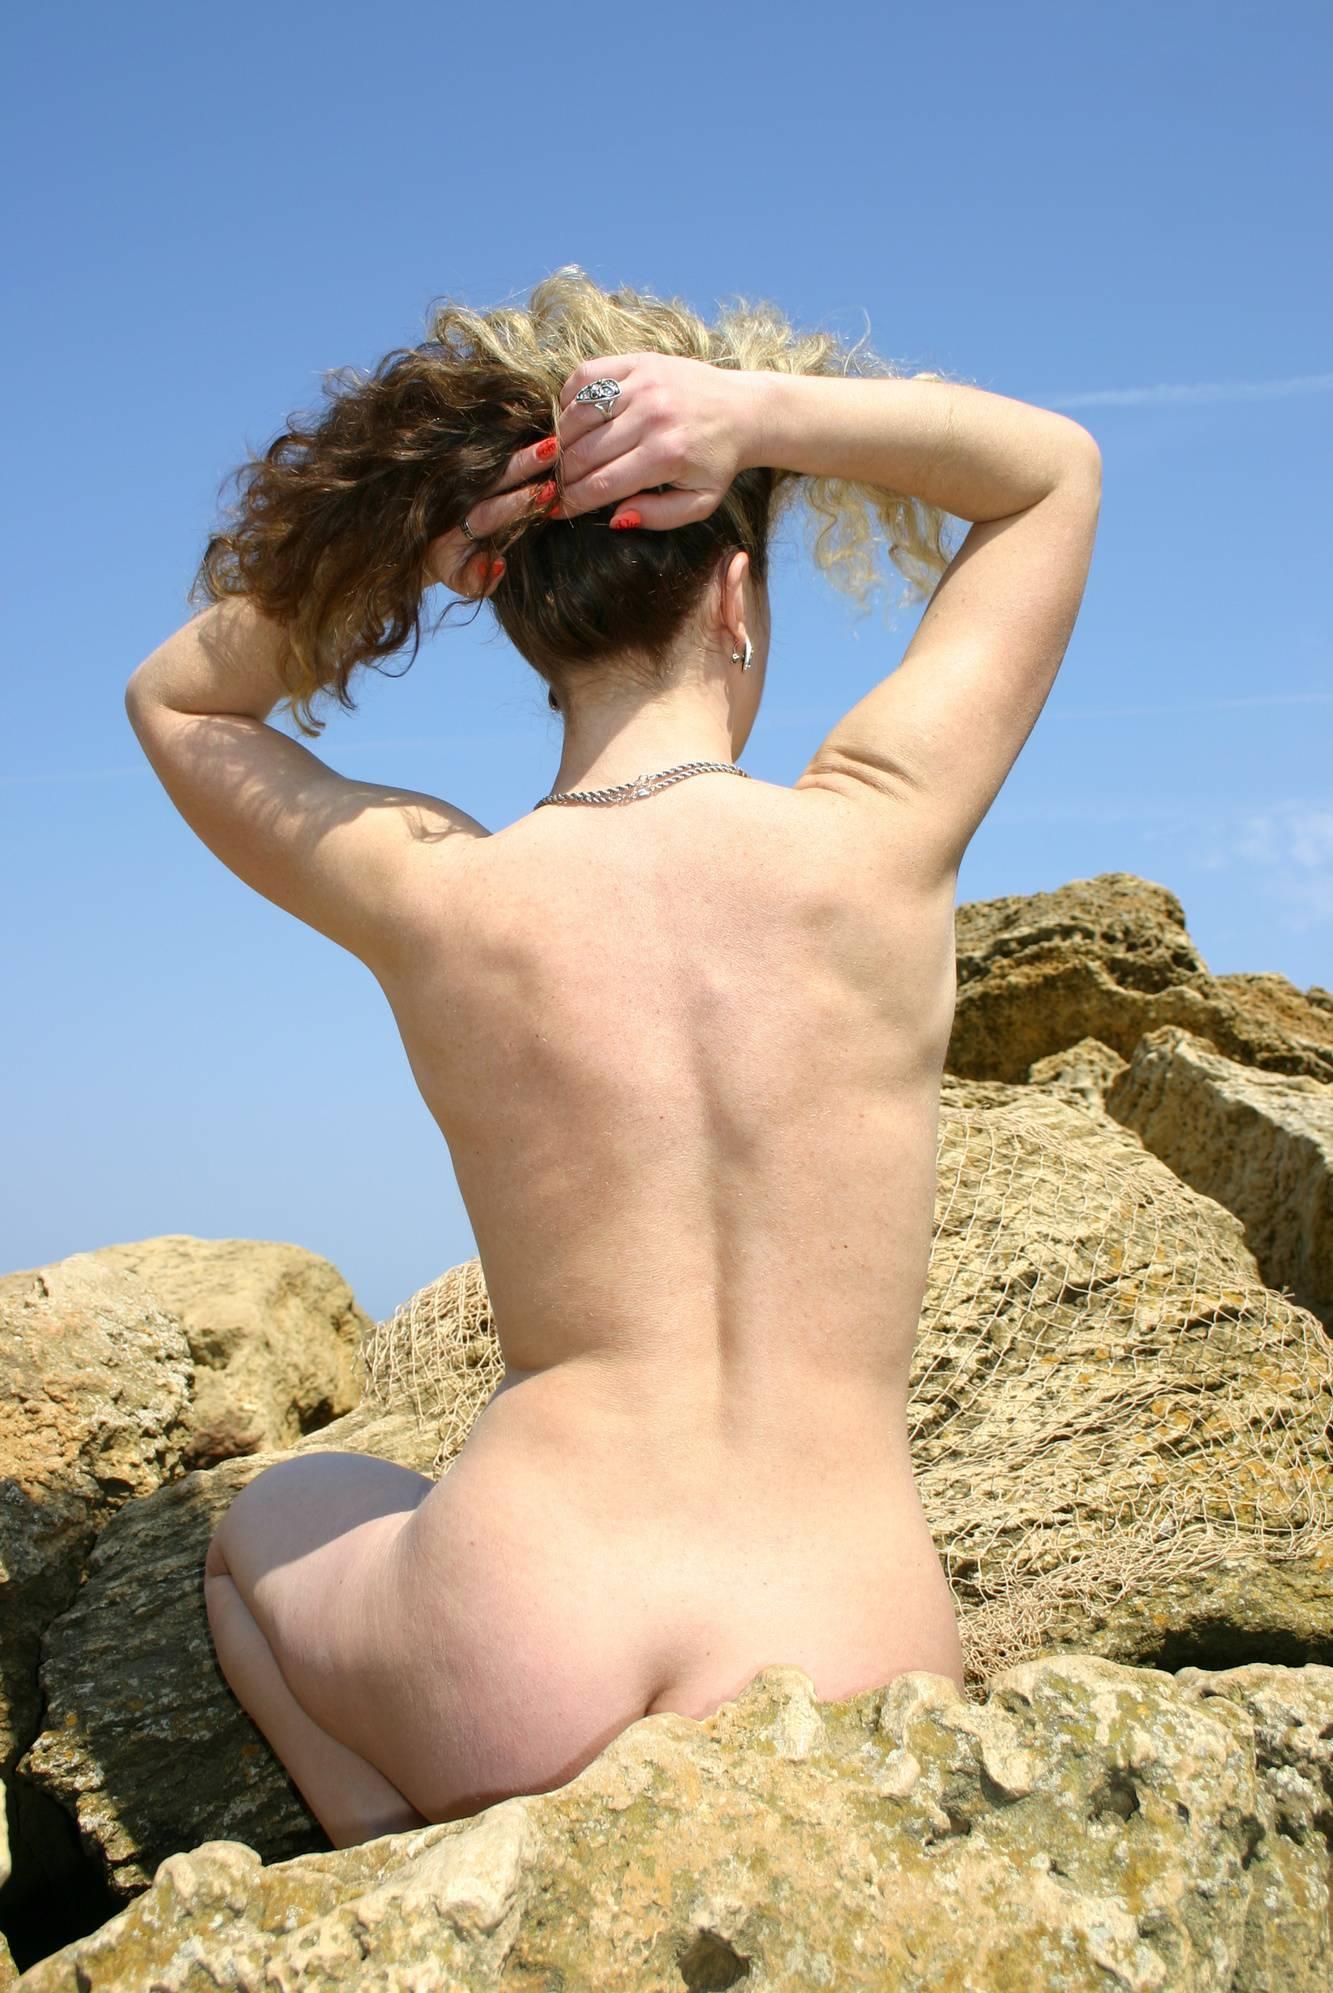 Nudist Photos Mother Nude Mountain Net - 1